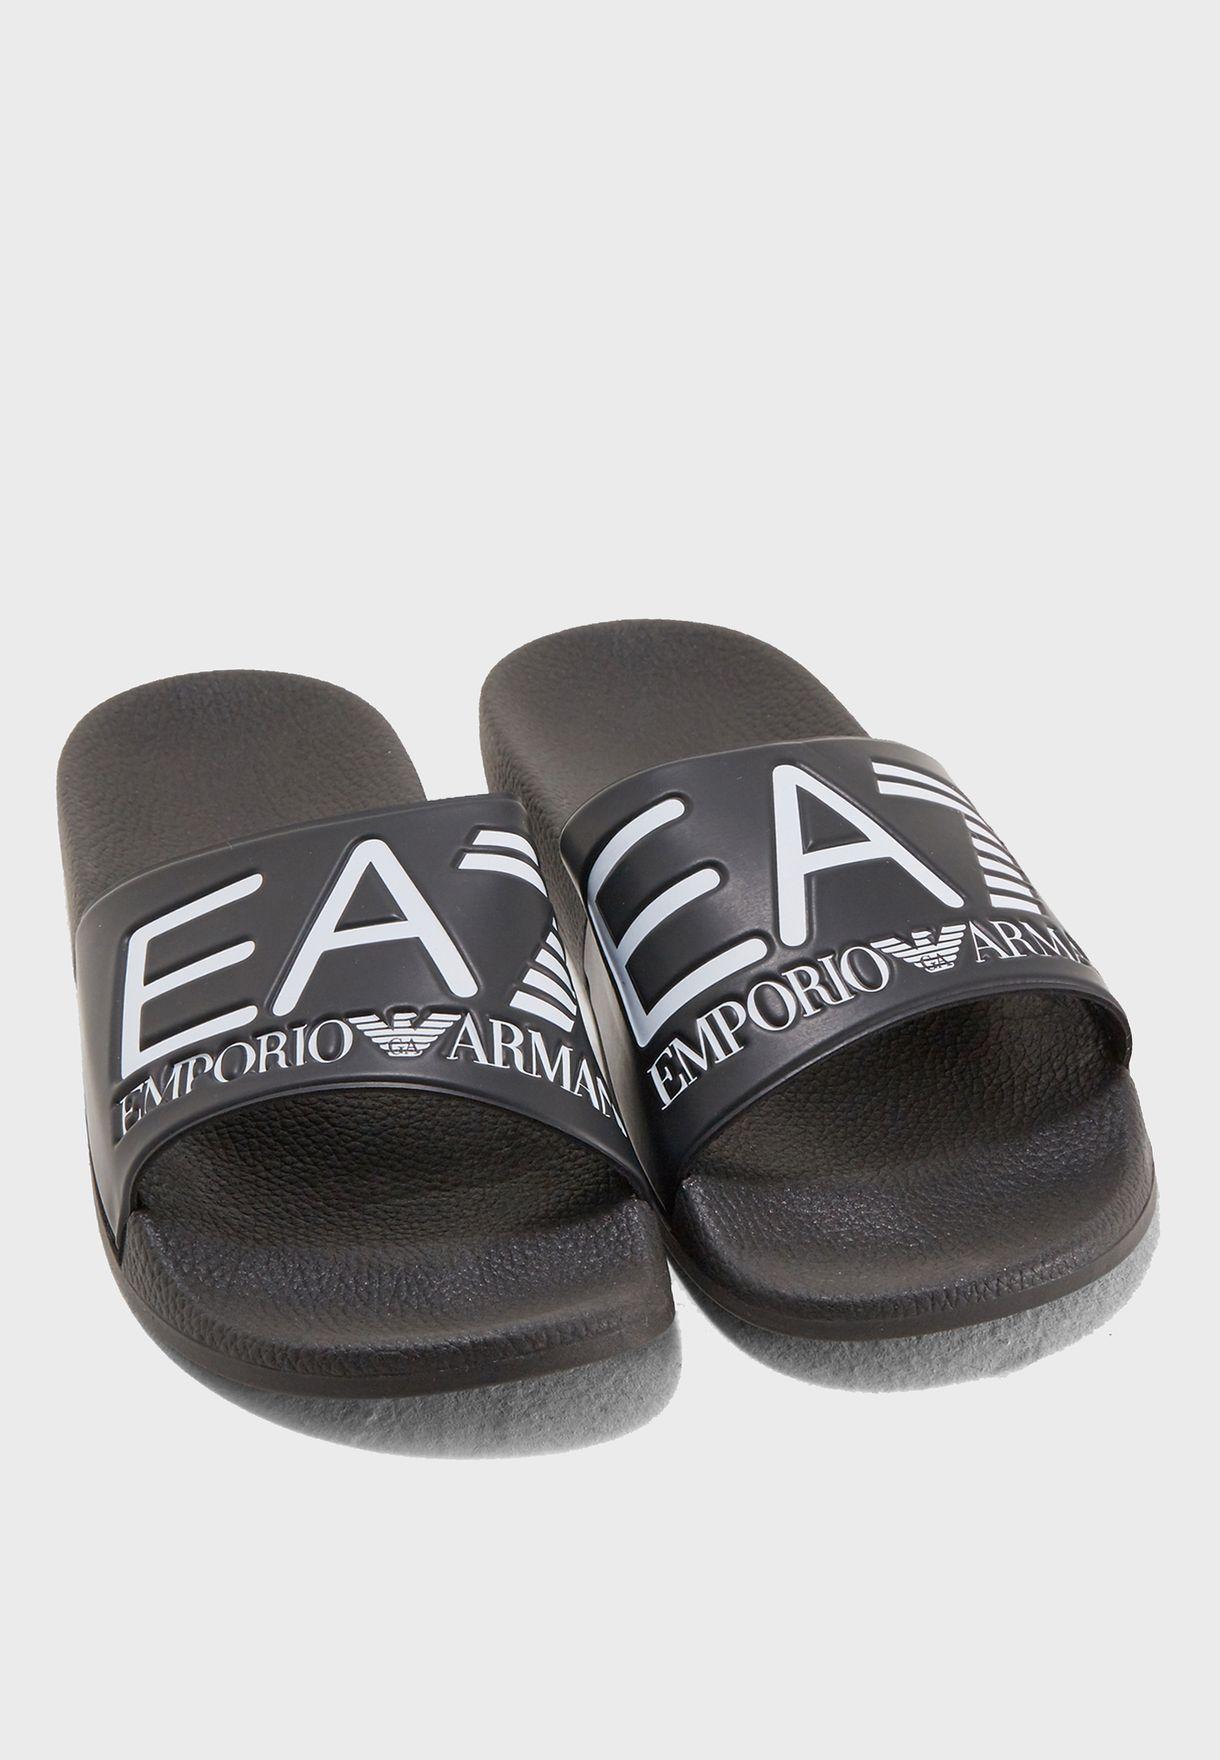 15d46a9c9ede Shop Ea7 Emporio Armani black SEA WORLD Visibility Slides 8P215 ...